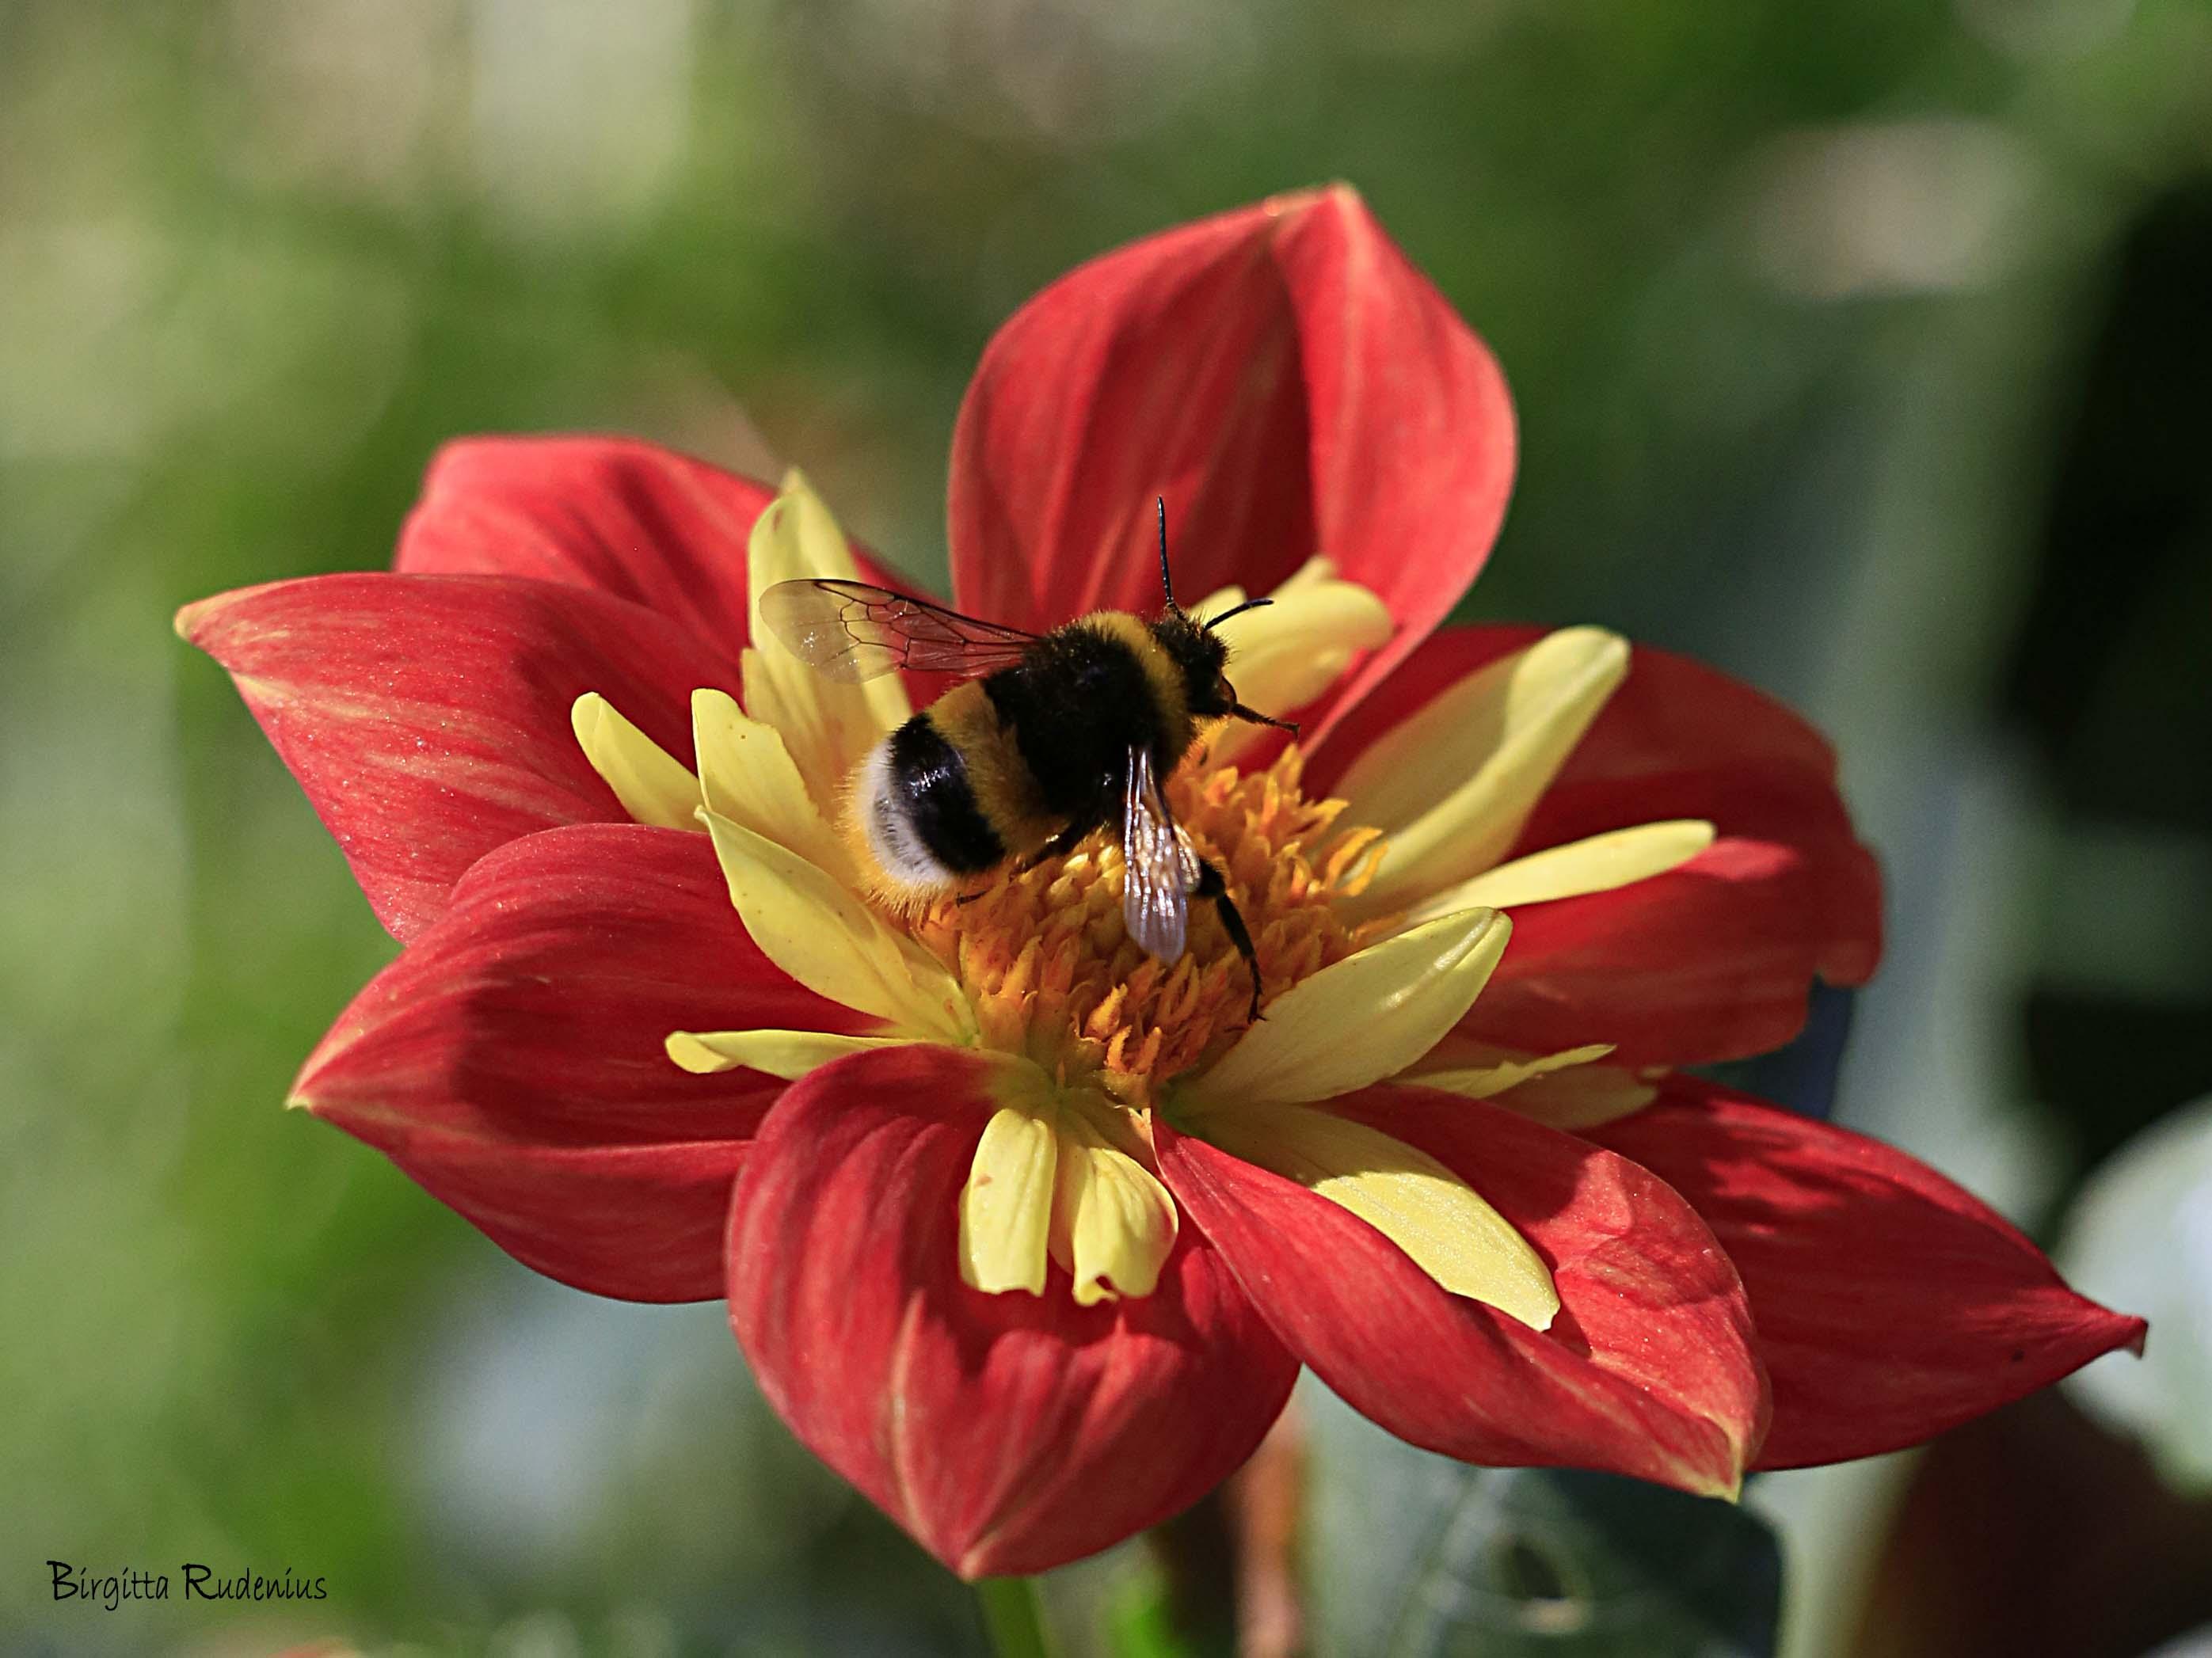 Bumblebee - Humla © Birgitta Rudenius